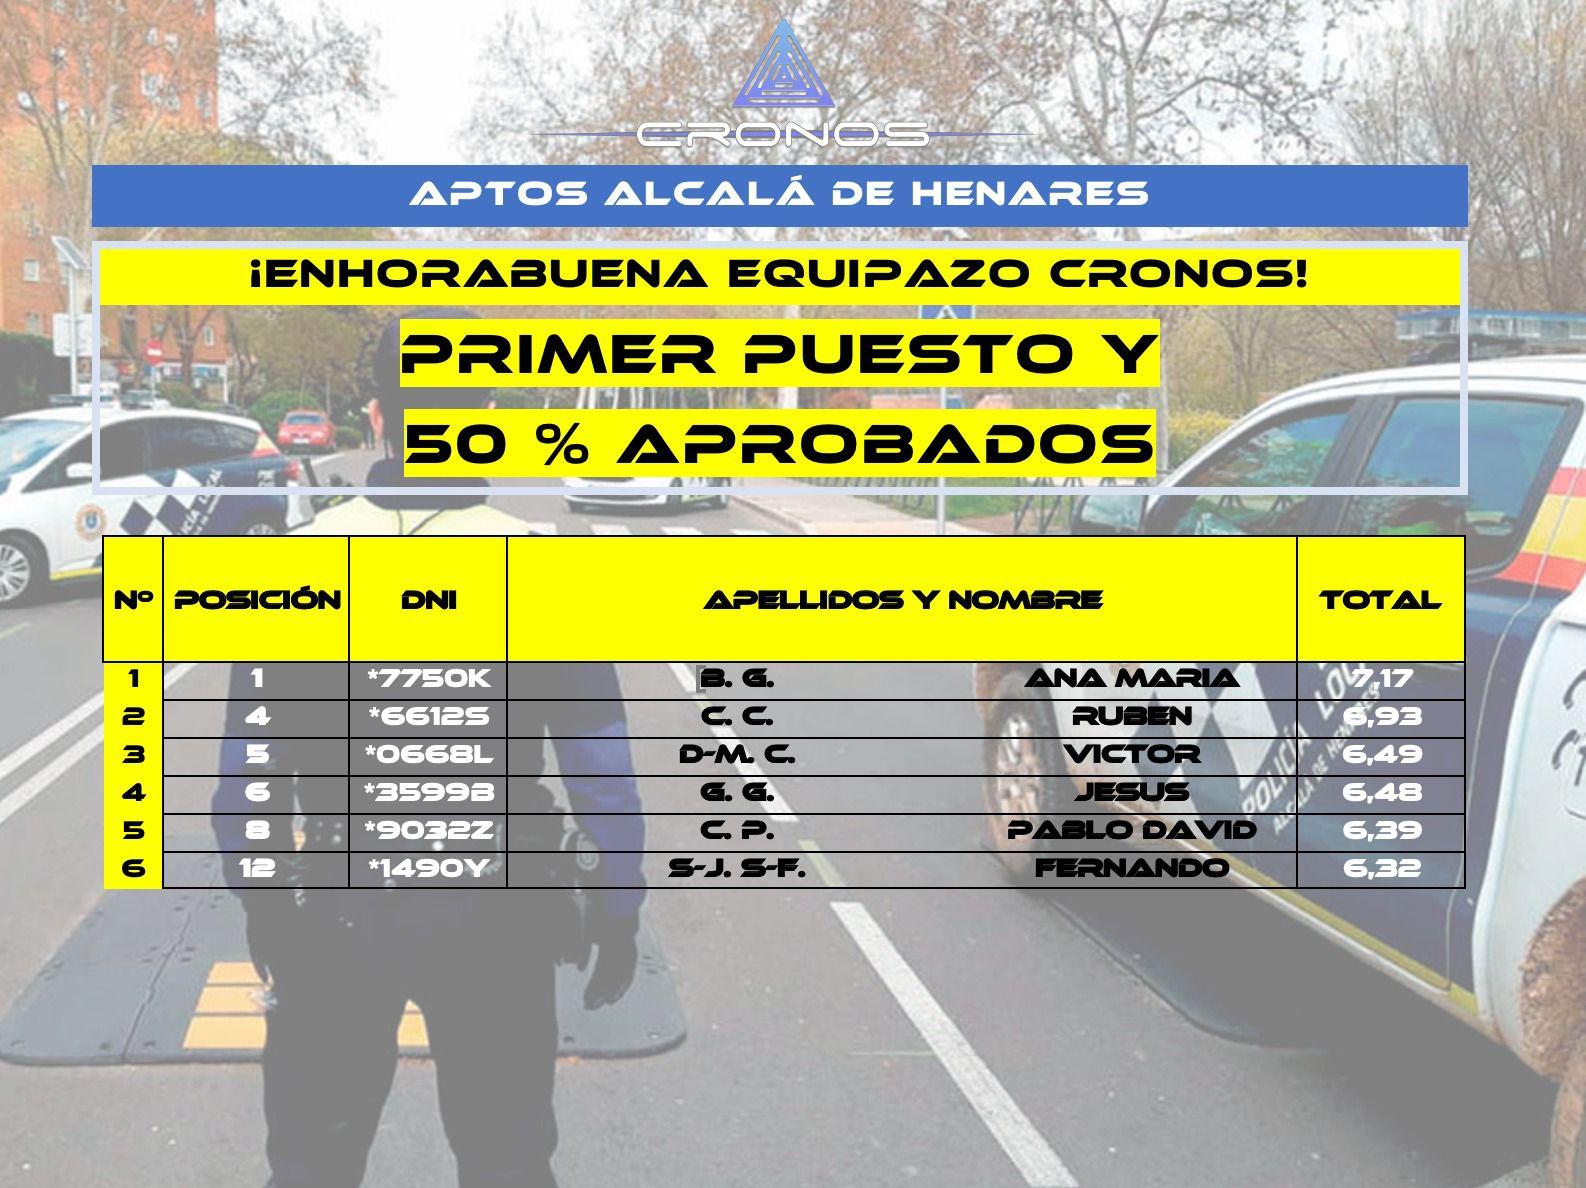 aprobados alcalá 19_10_21 CRONOS